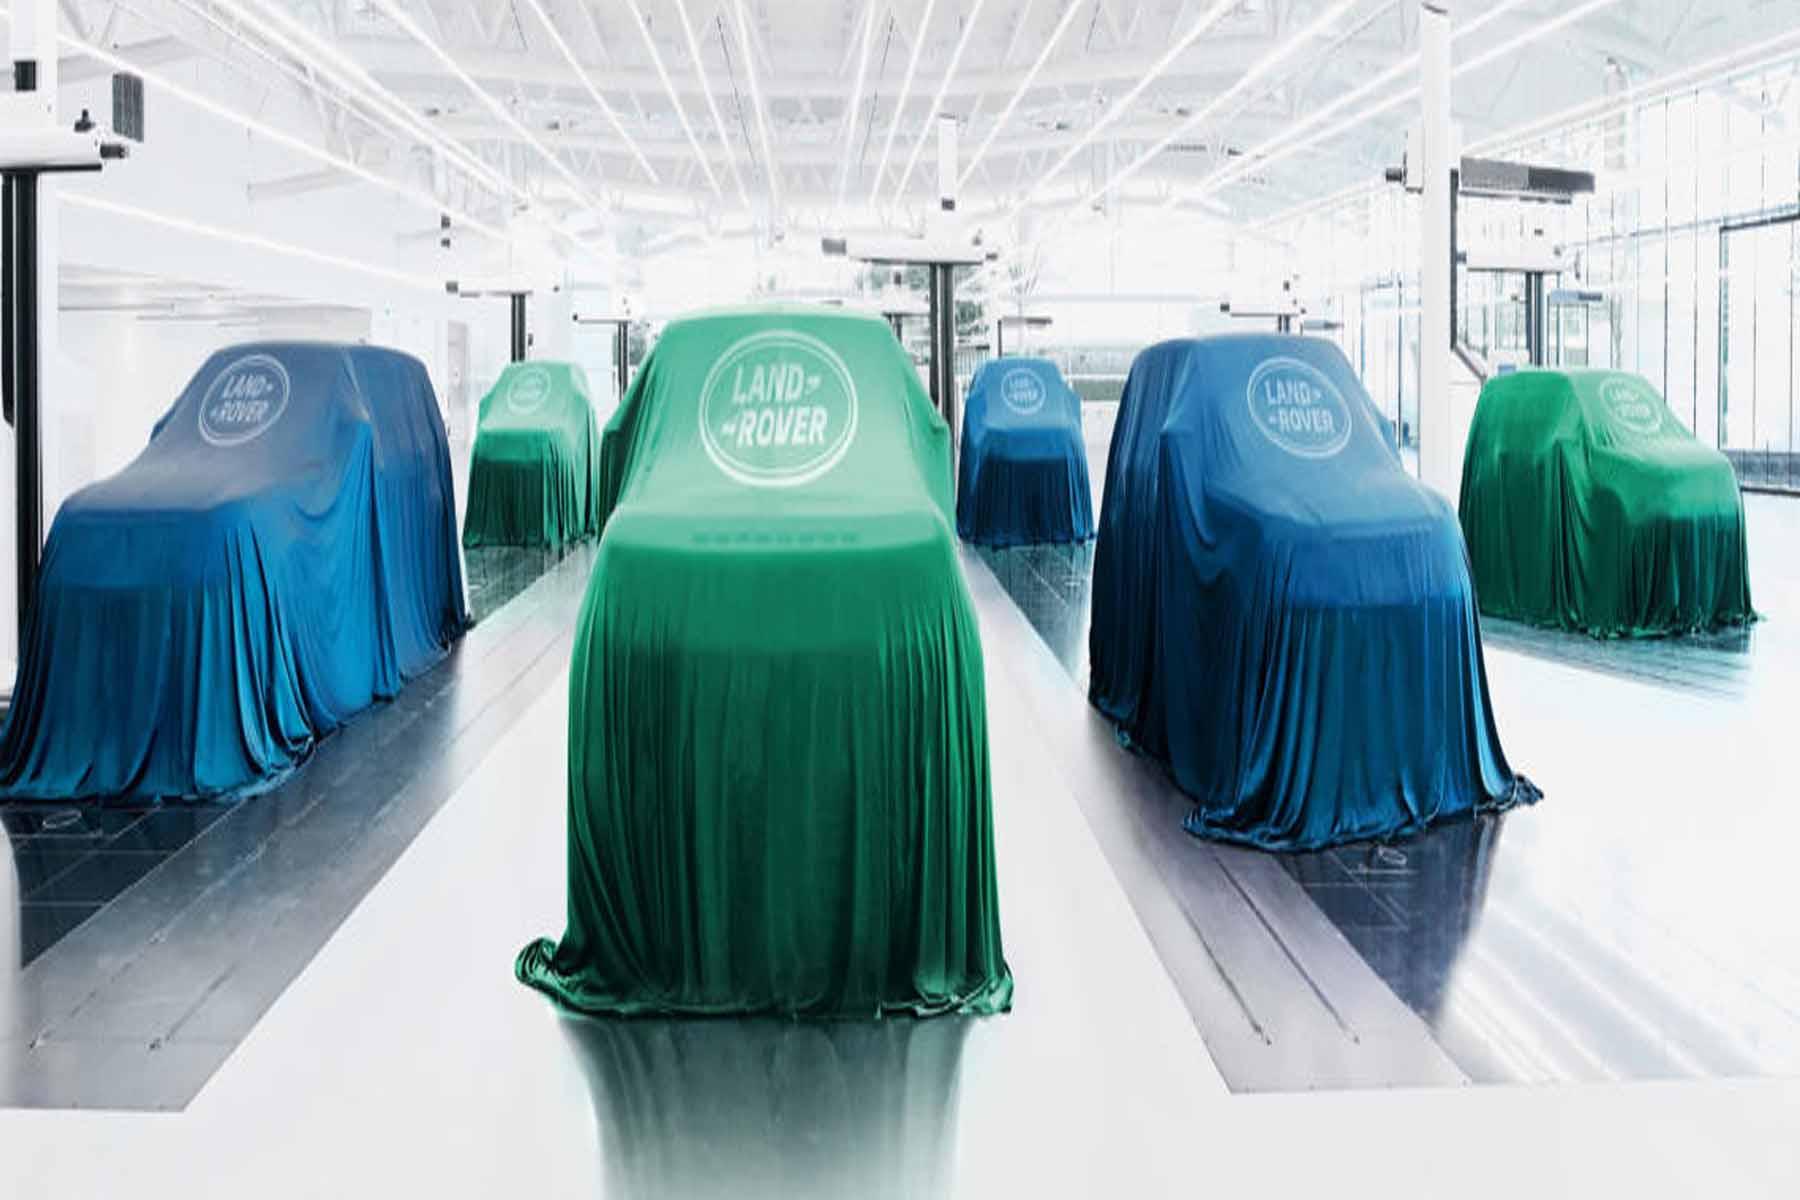 Jaguar Land Rover Akan Jadi Pengeluar Kereta Elektrik Sepenuhnya Menjelang 2025